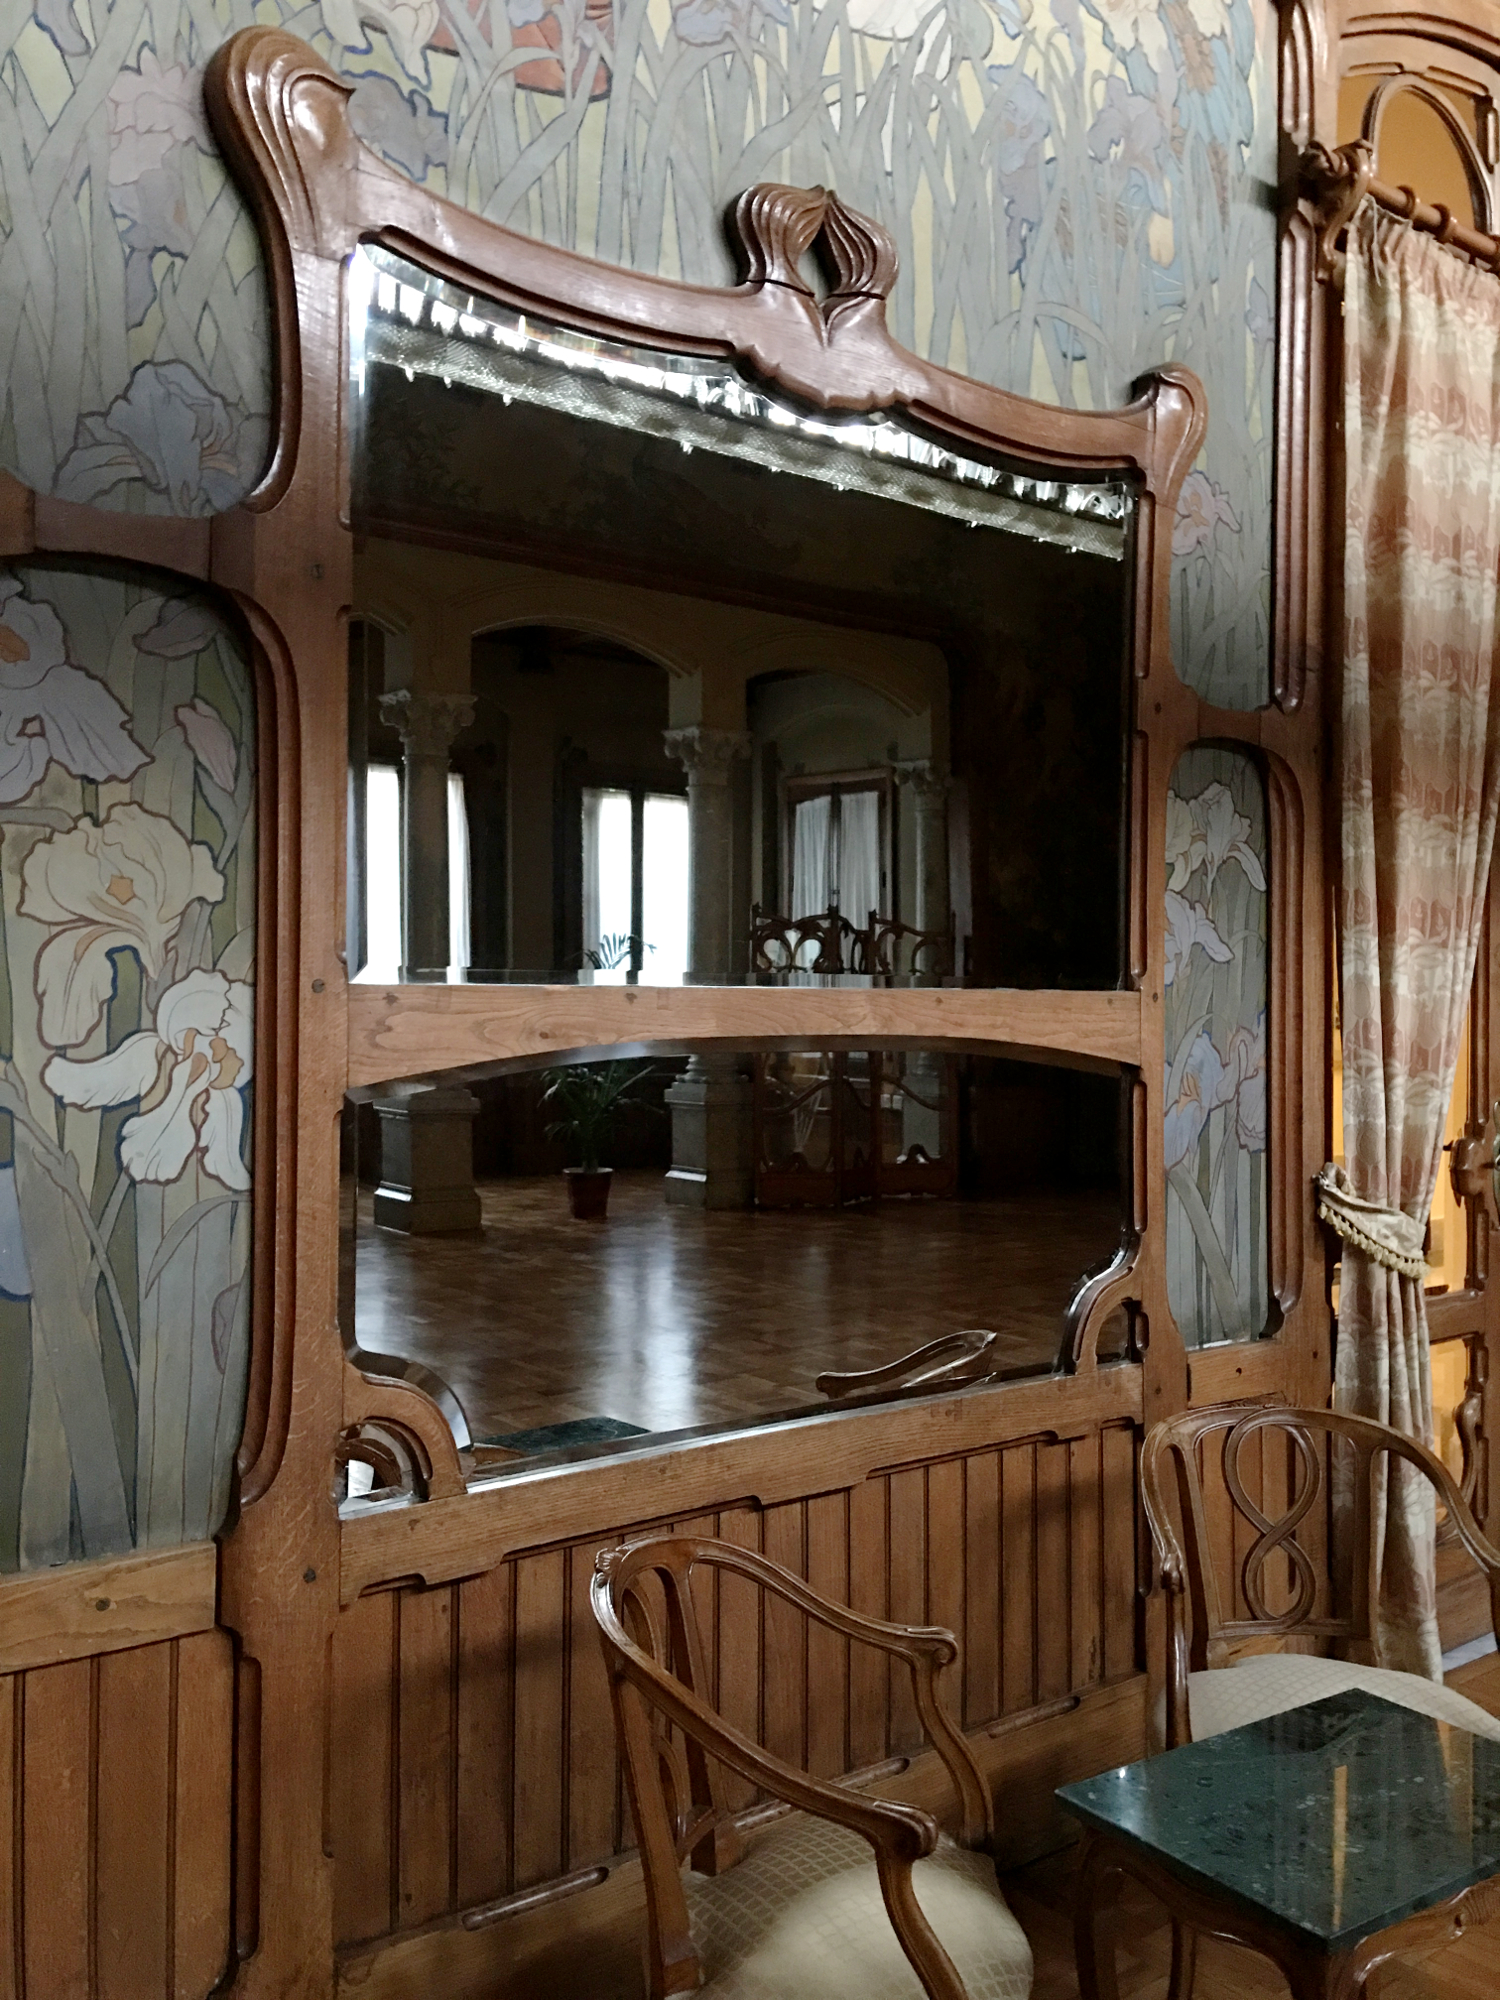 rocaille-blog-palermo-hotel-villa-igiea-liberty-15